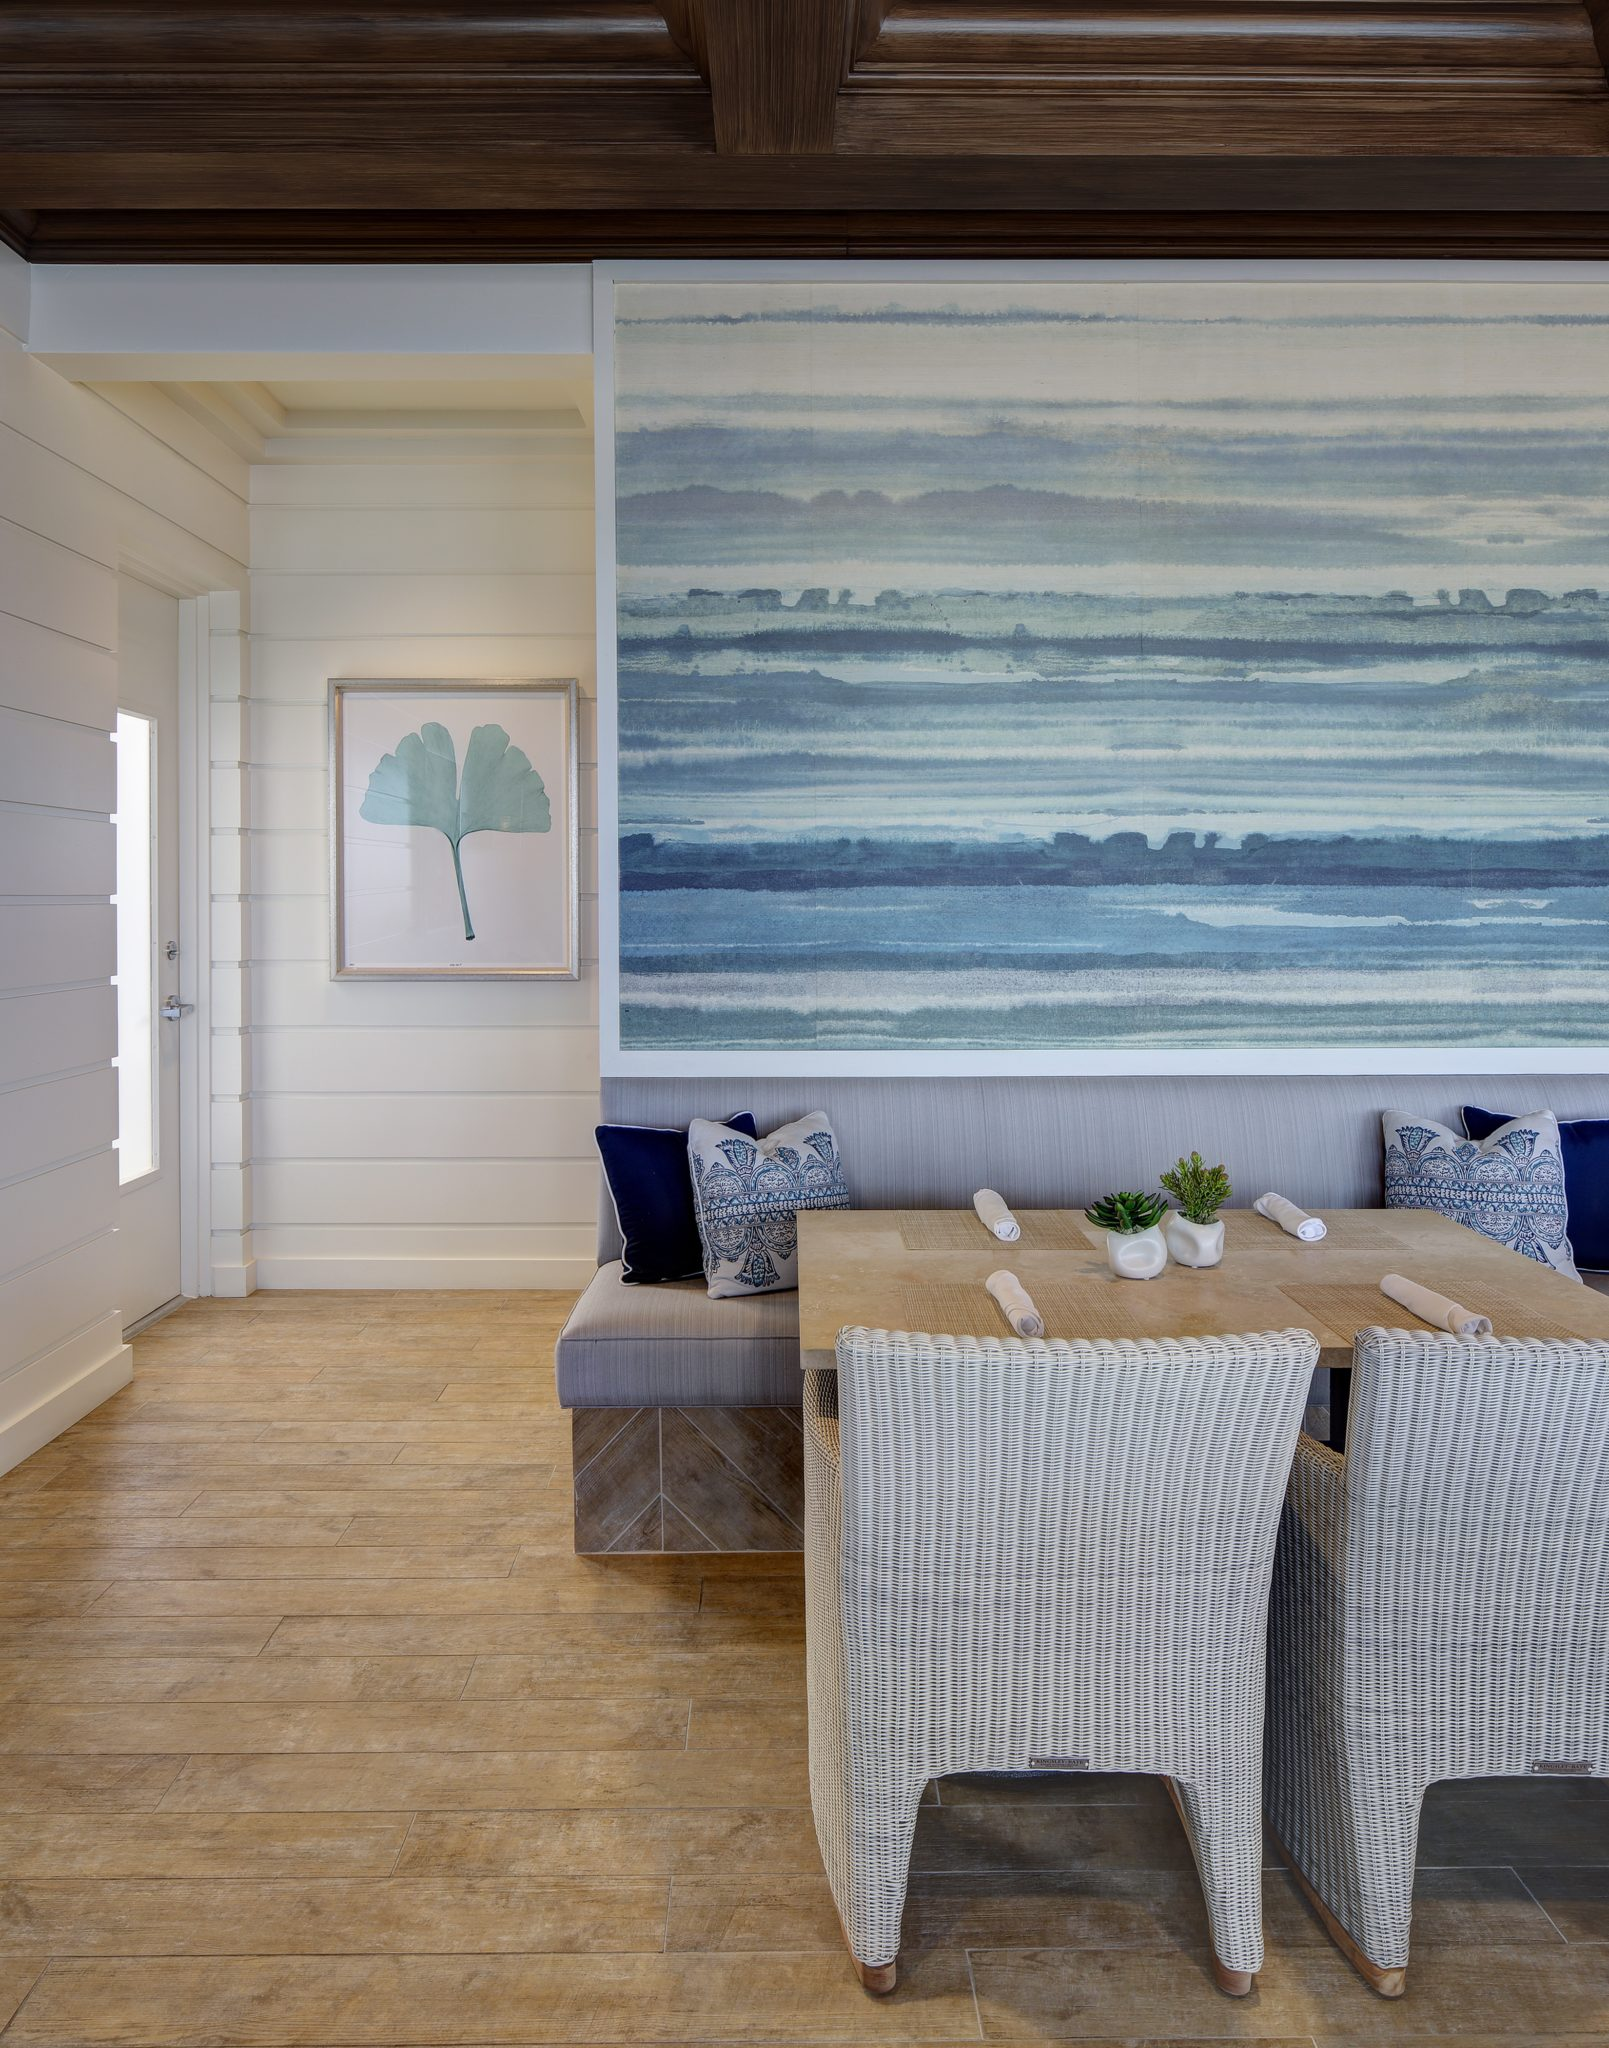 Interior design byW Design